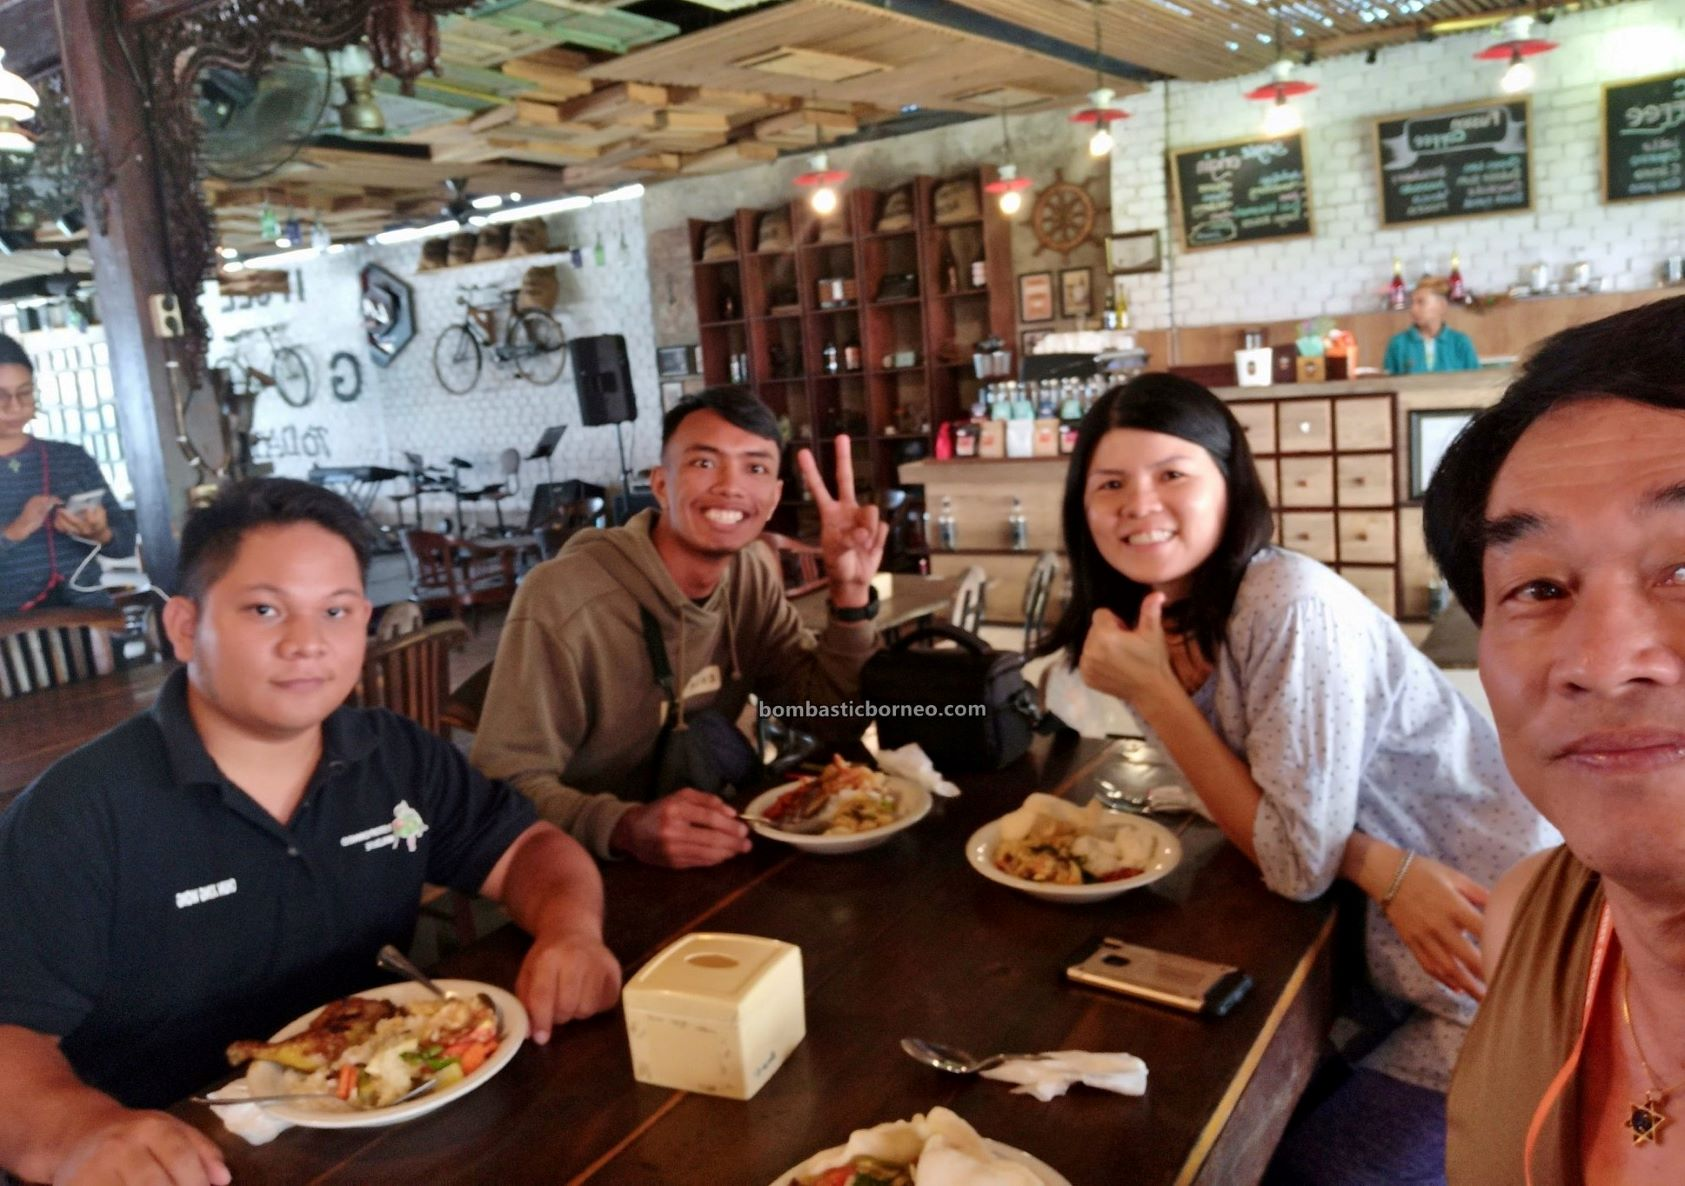 FAM Trip, exploration, Indonesia, Kalimantan Utara, Kaltara, objek wisata, Pariwisata, Tourism, tourist attraction, Cross Border, Trans Borneo, 北加里曼丹打拉根岛,